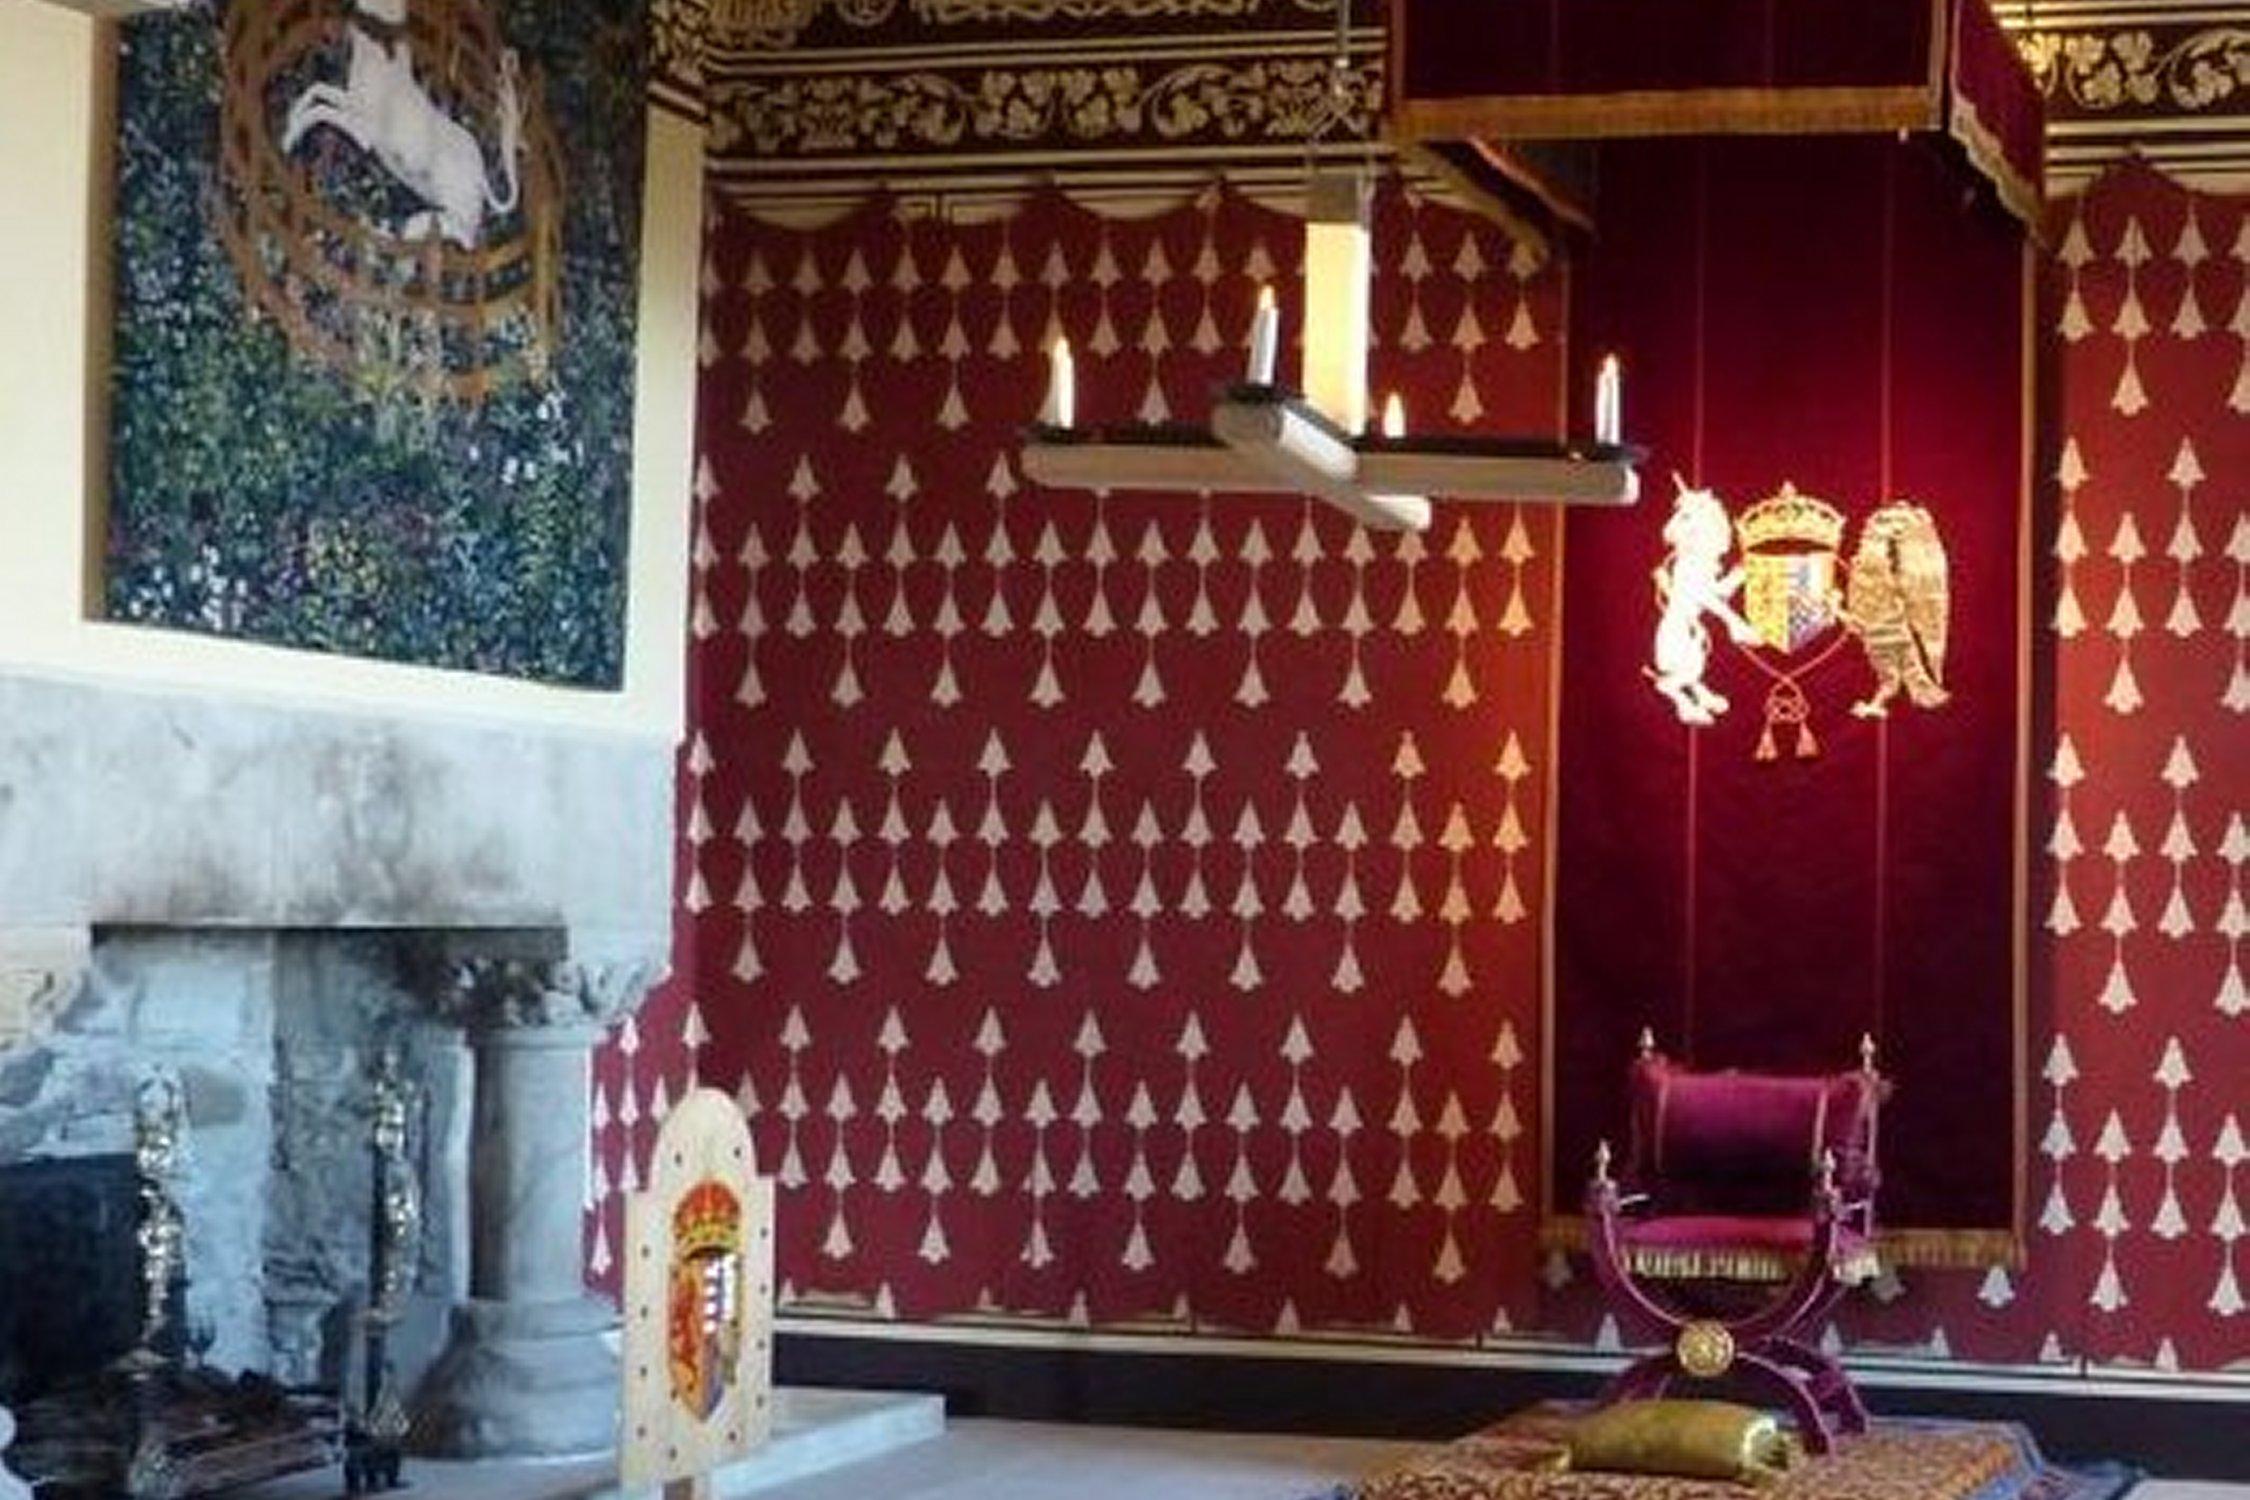 The Queen's Inner Chamber